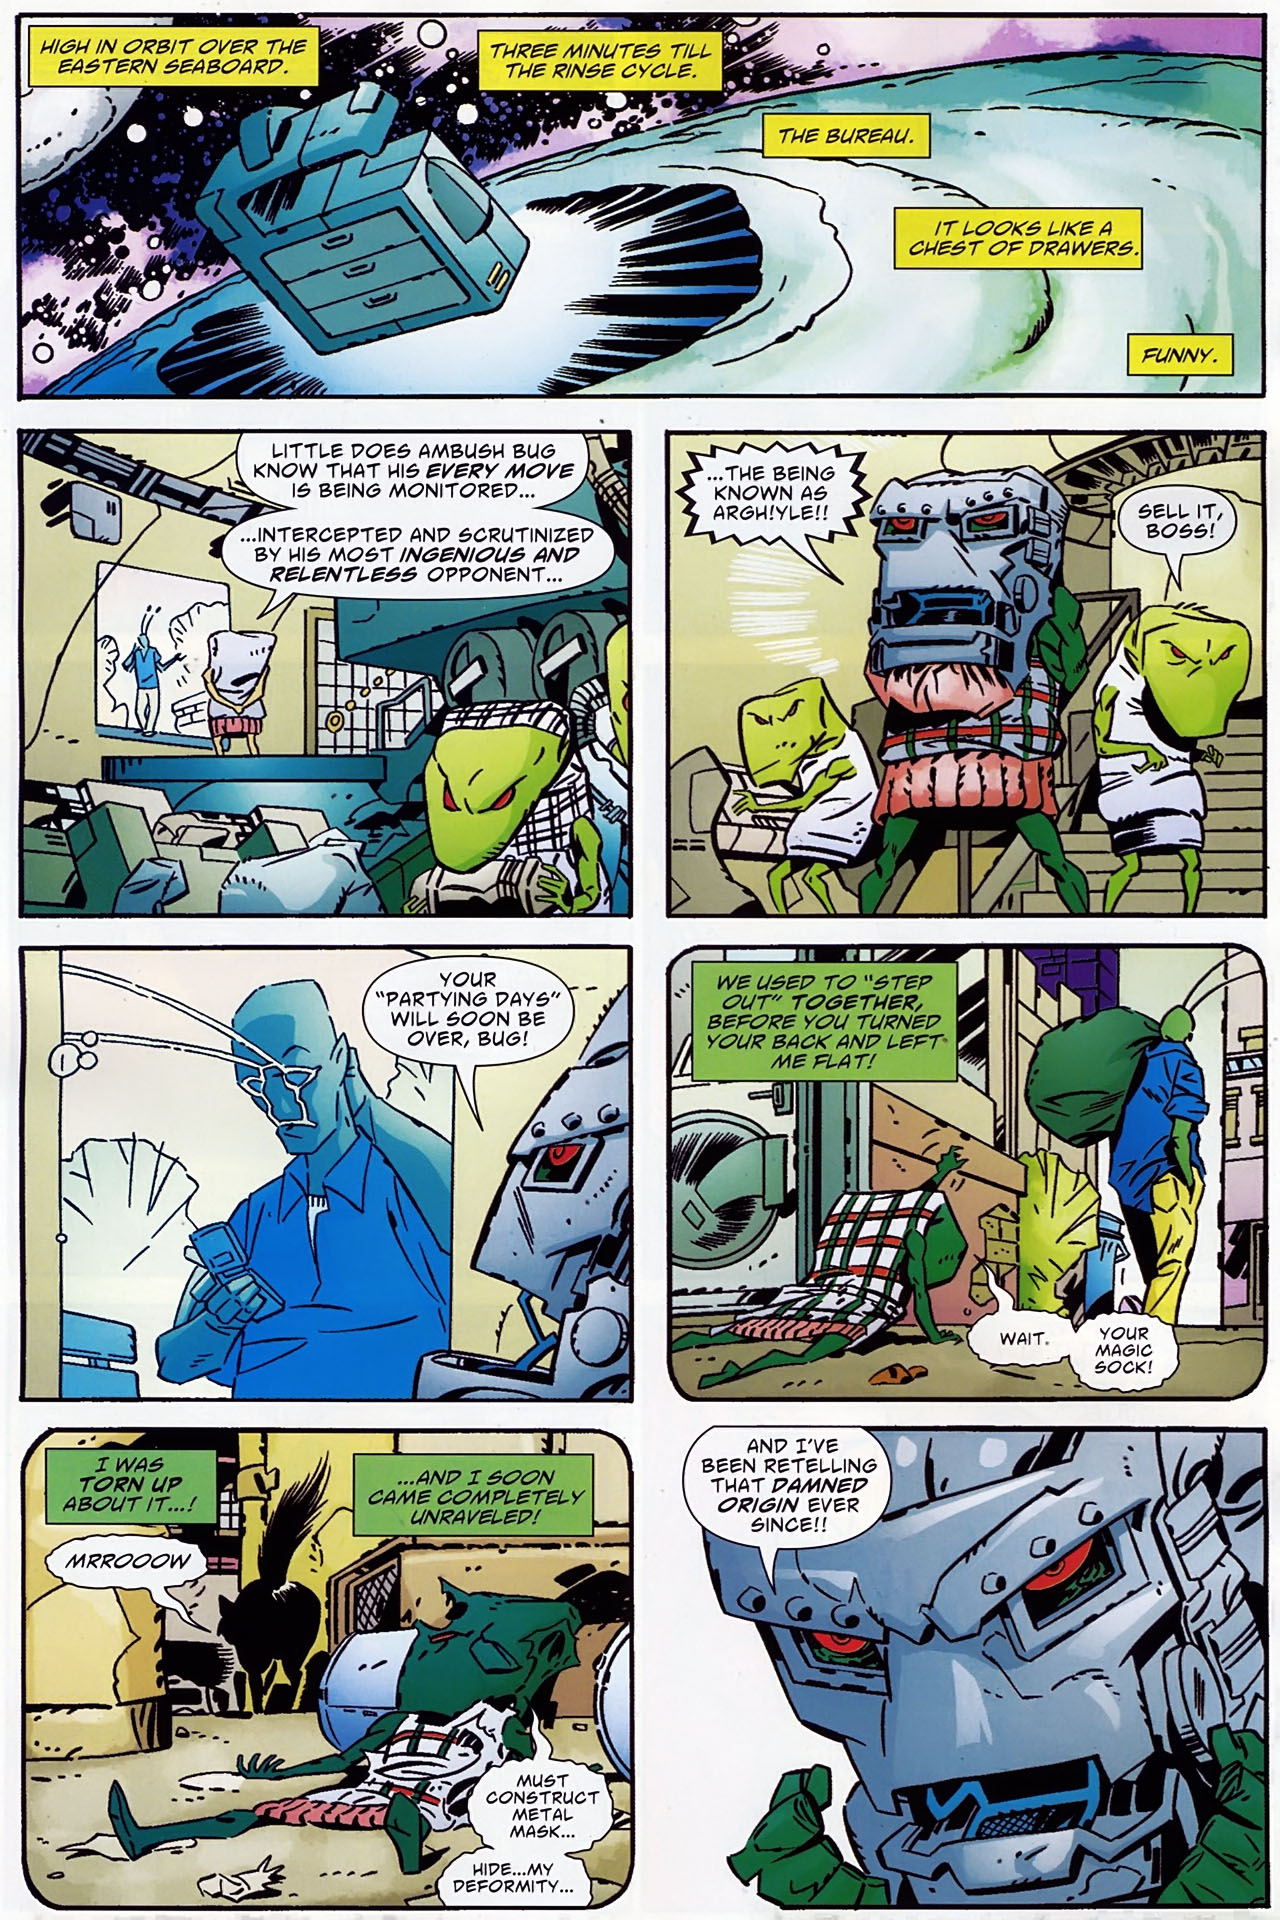 Read online Ambush Bug: Year None comic -  Issue #1 - 9